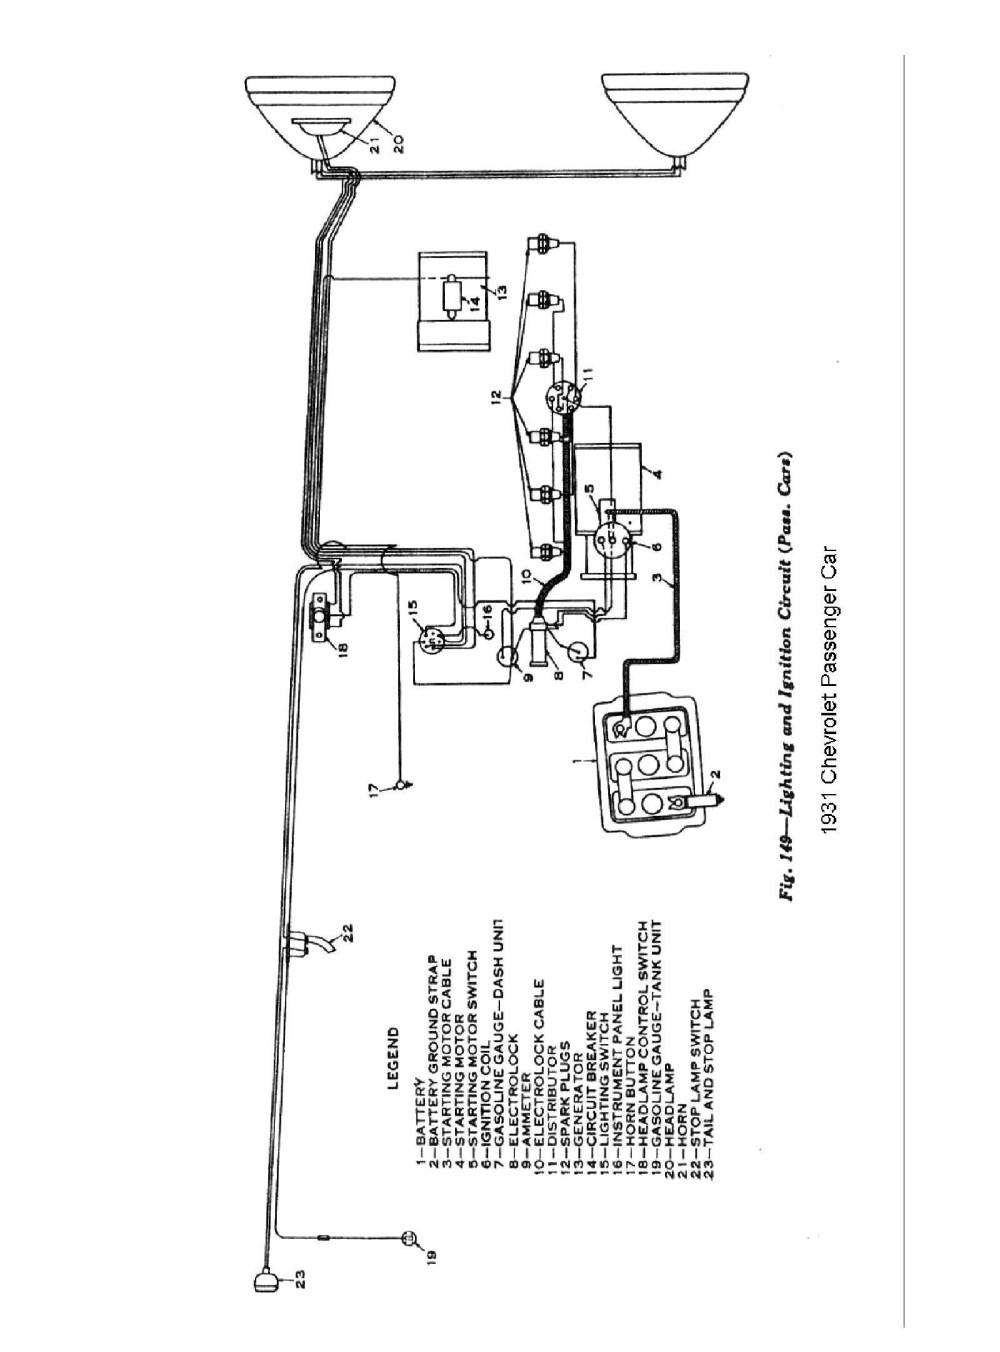 medium resolution of jeep 3 8l engine diagram schematics wiring diagrams u2022 rh seniorlivinguniversity co ford 3 7 v6 engine